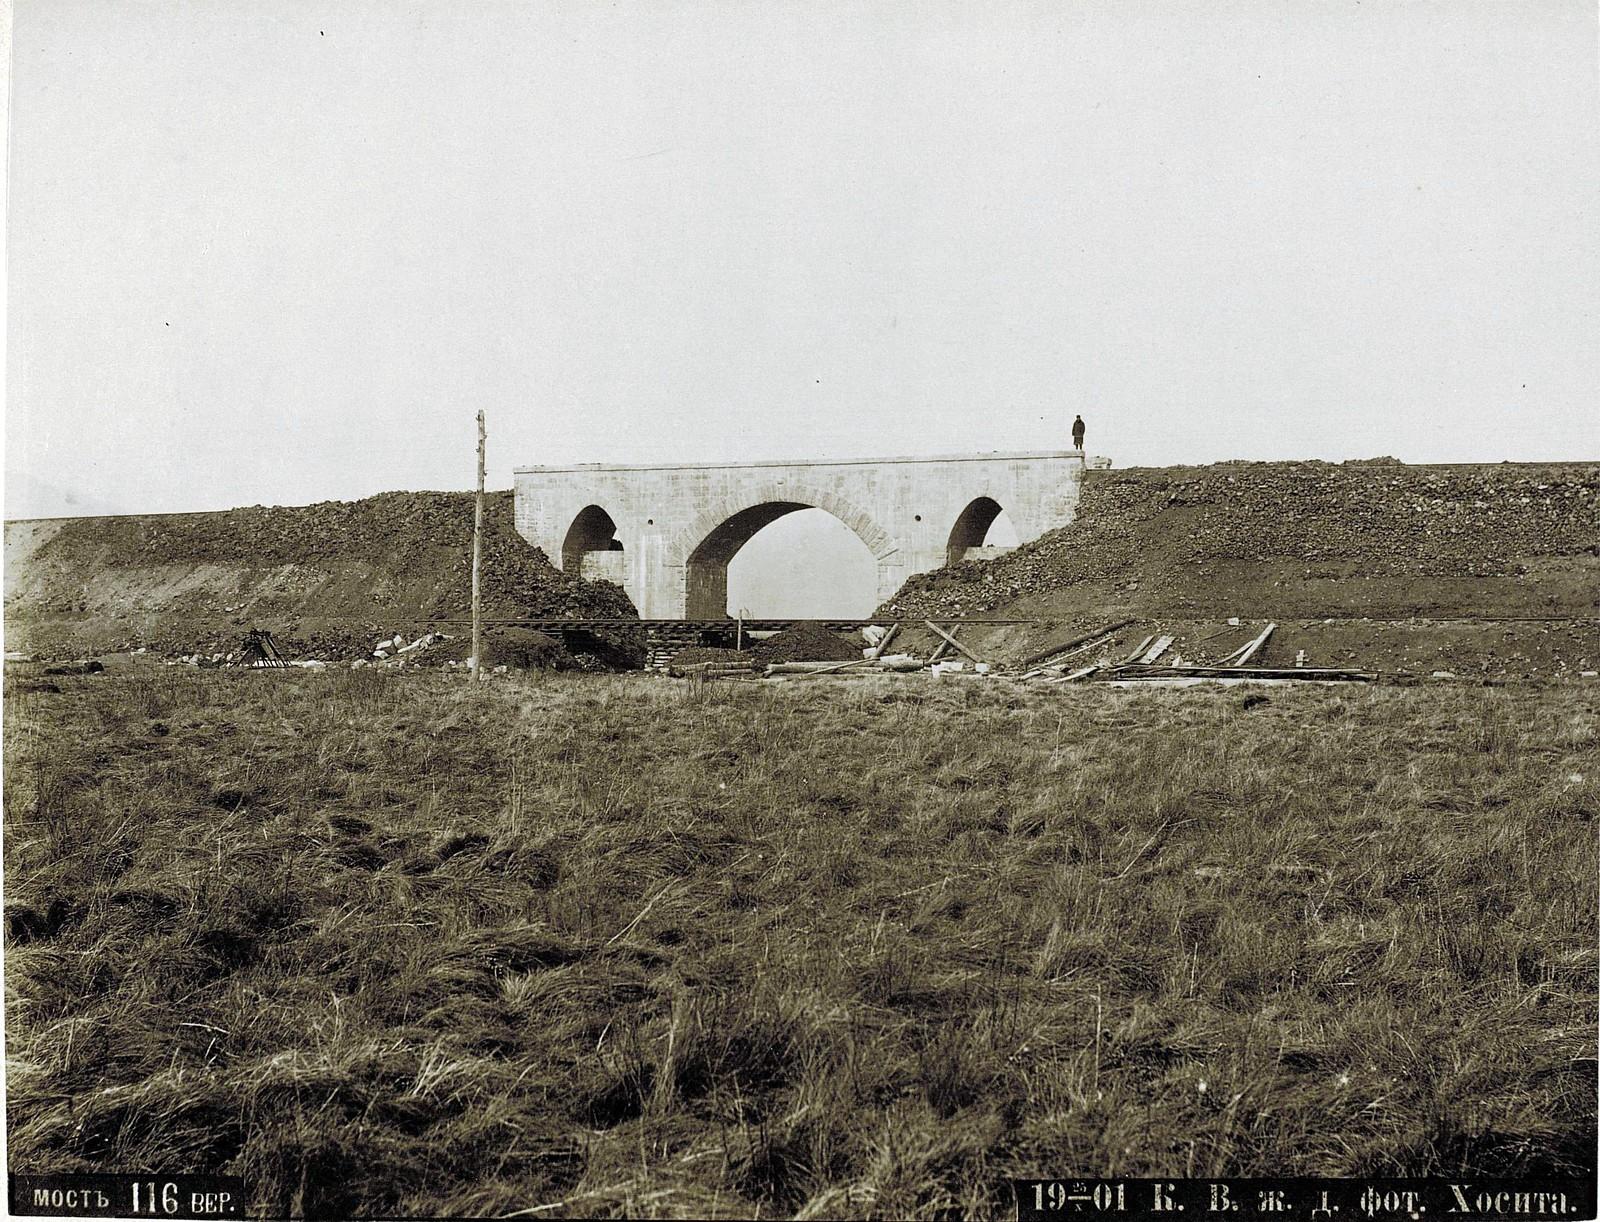 13.Мост 116 вер.